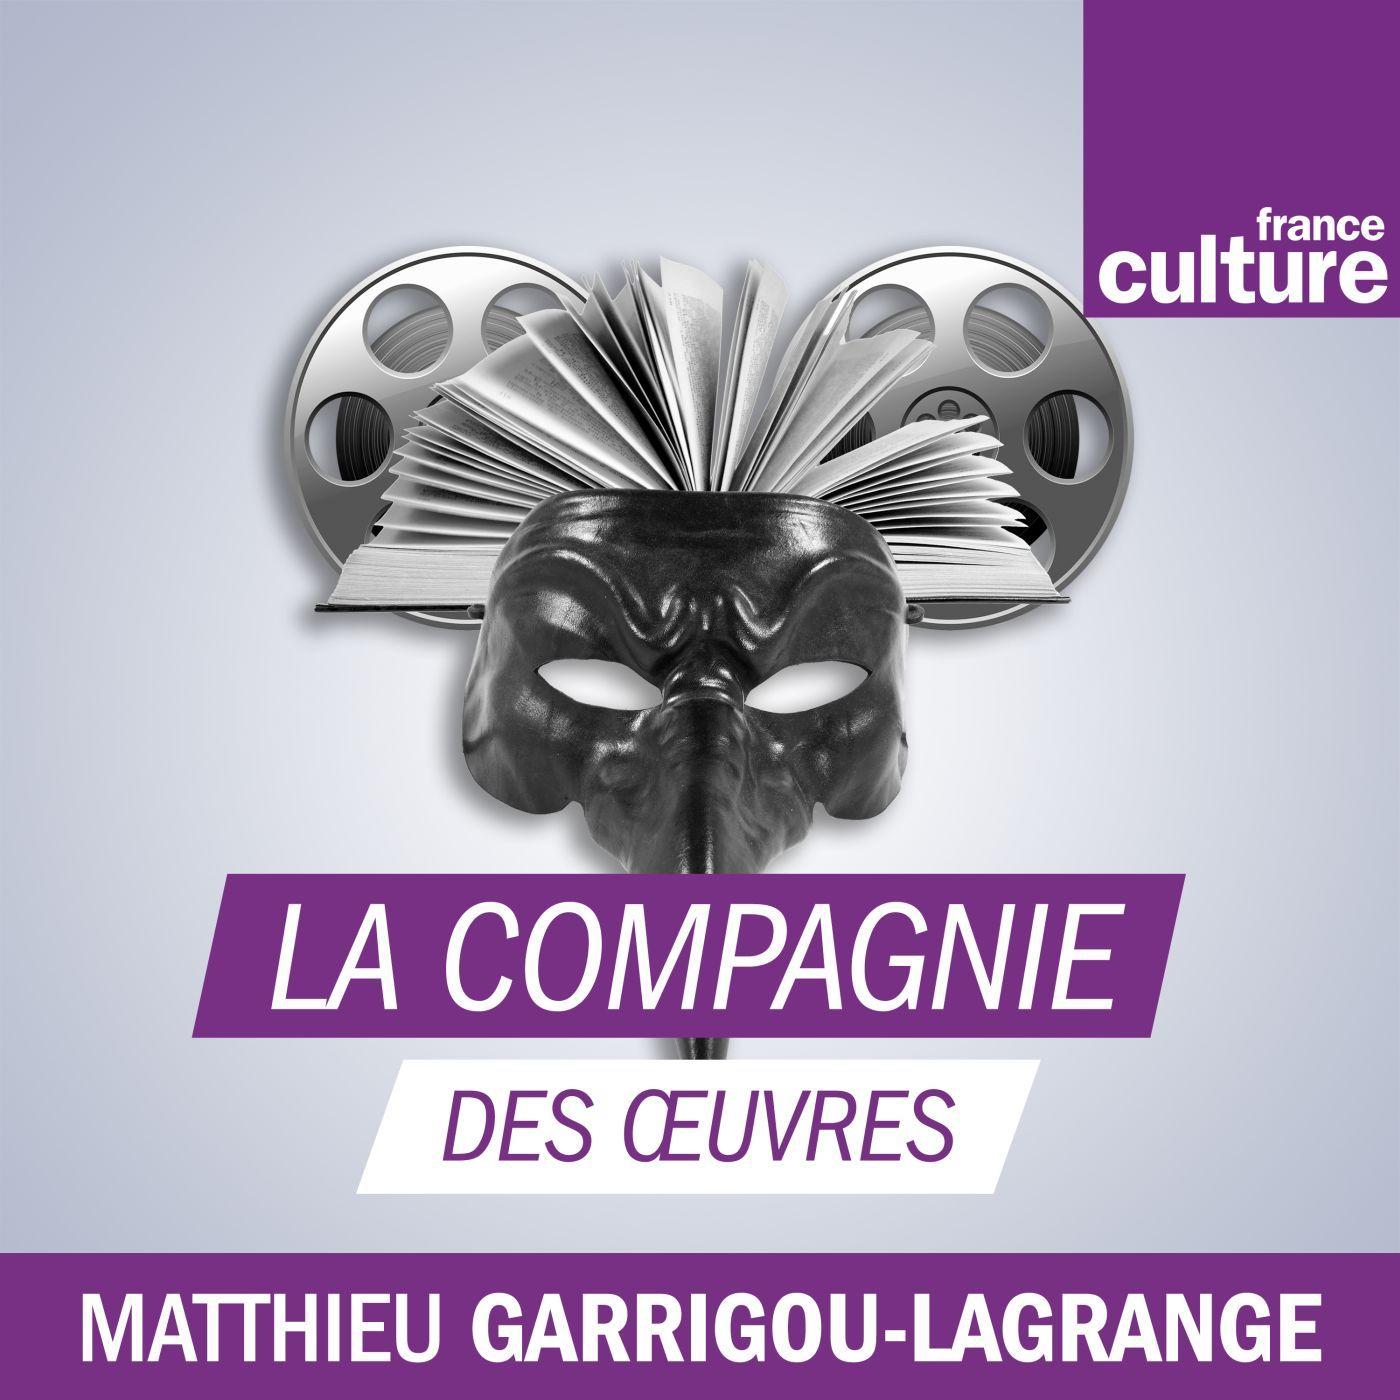 Image 1: La Compagnie des oeuvres